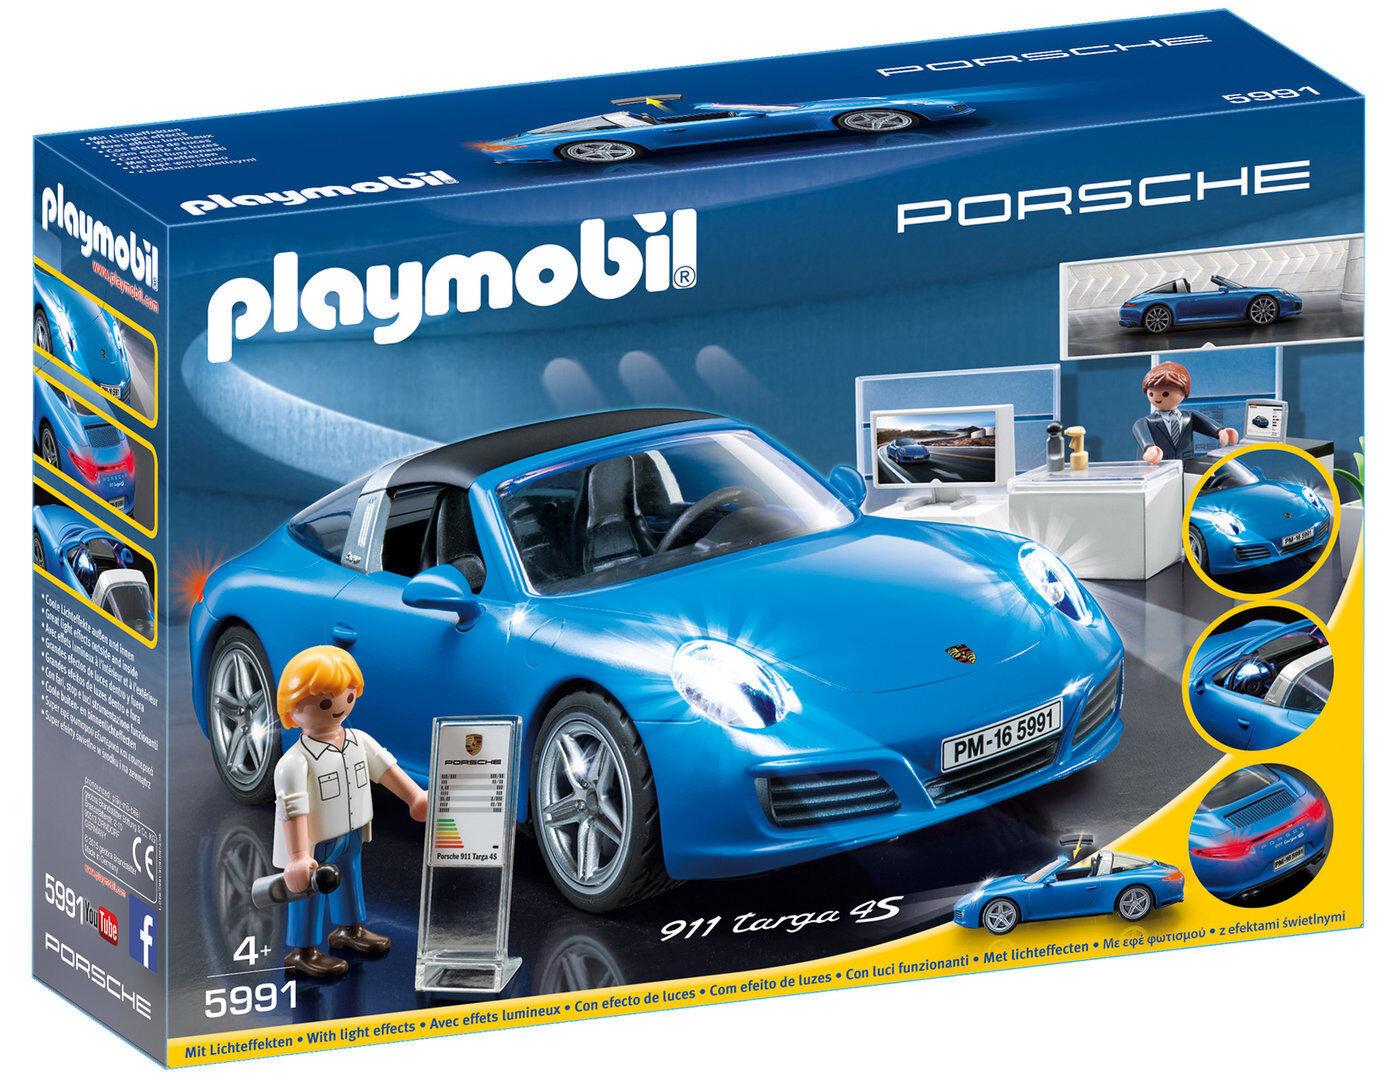 Playmobil 5991 - Porsche 911 Targa 4S - NUEVO